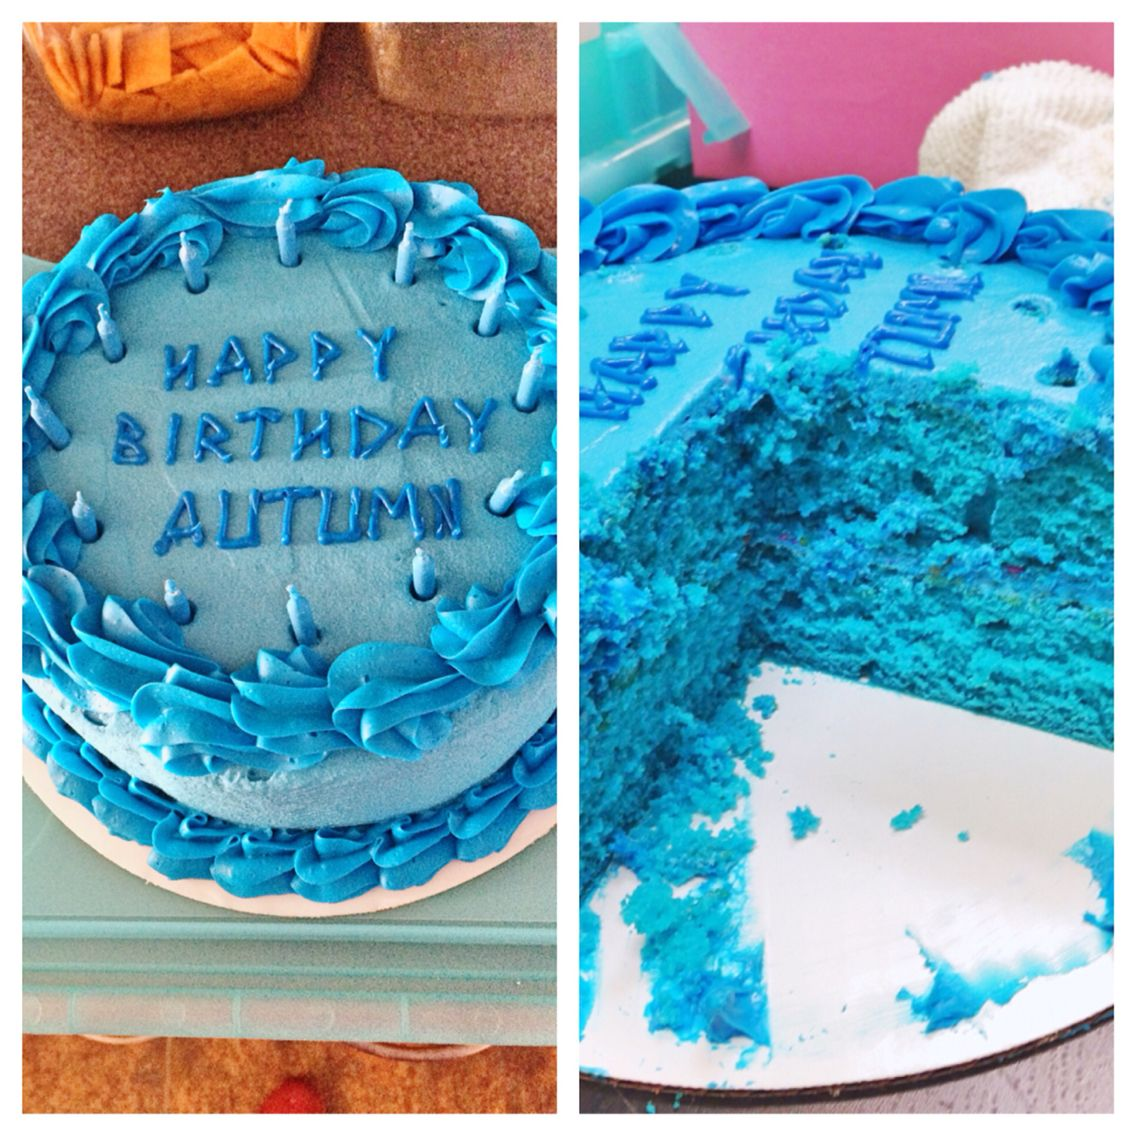 A Blue Birthday Cake To Make Percy Jackson Jealous Blue Velvet